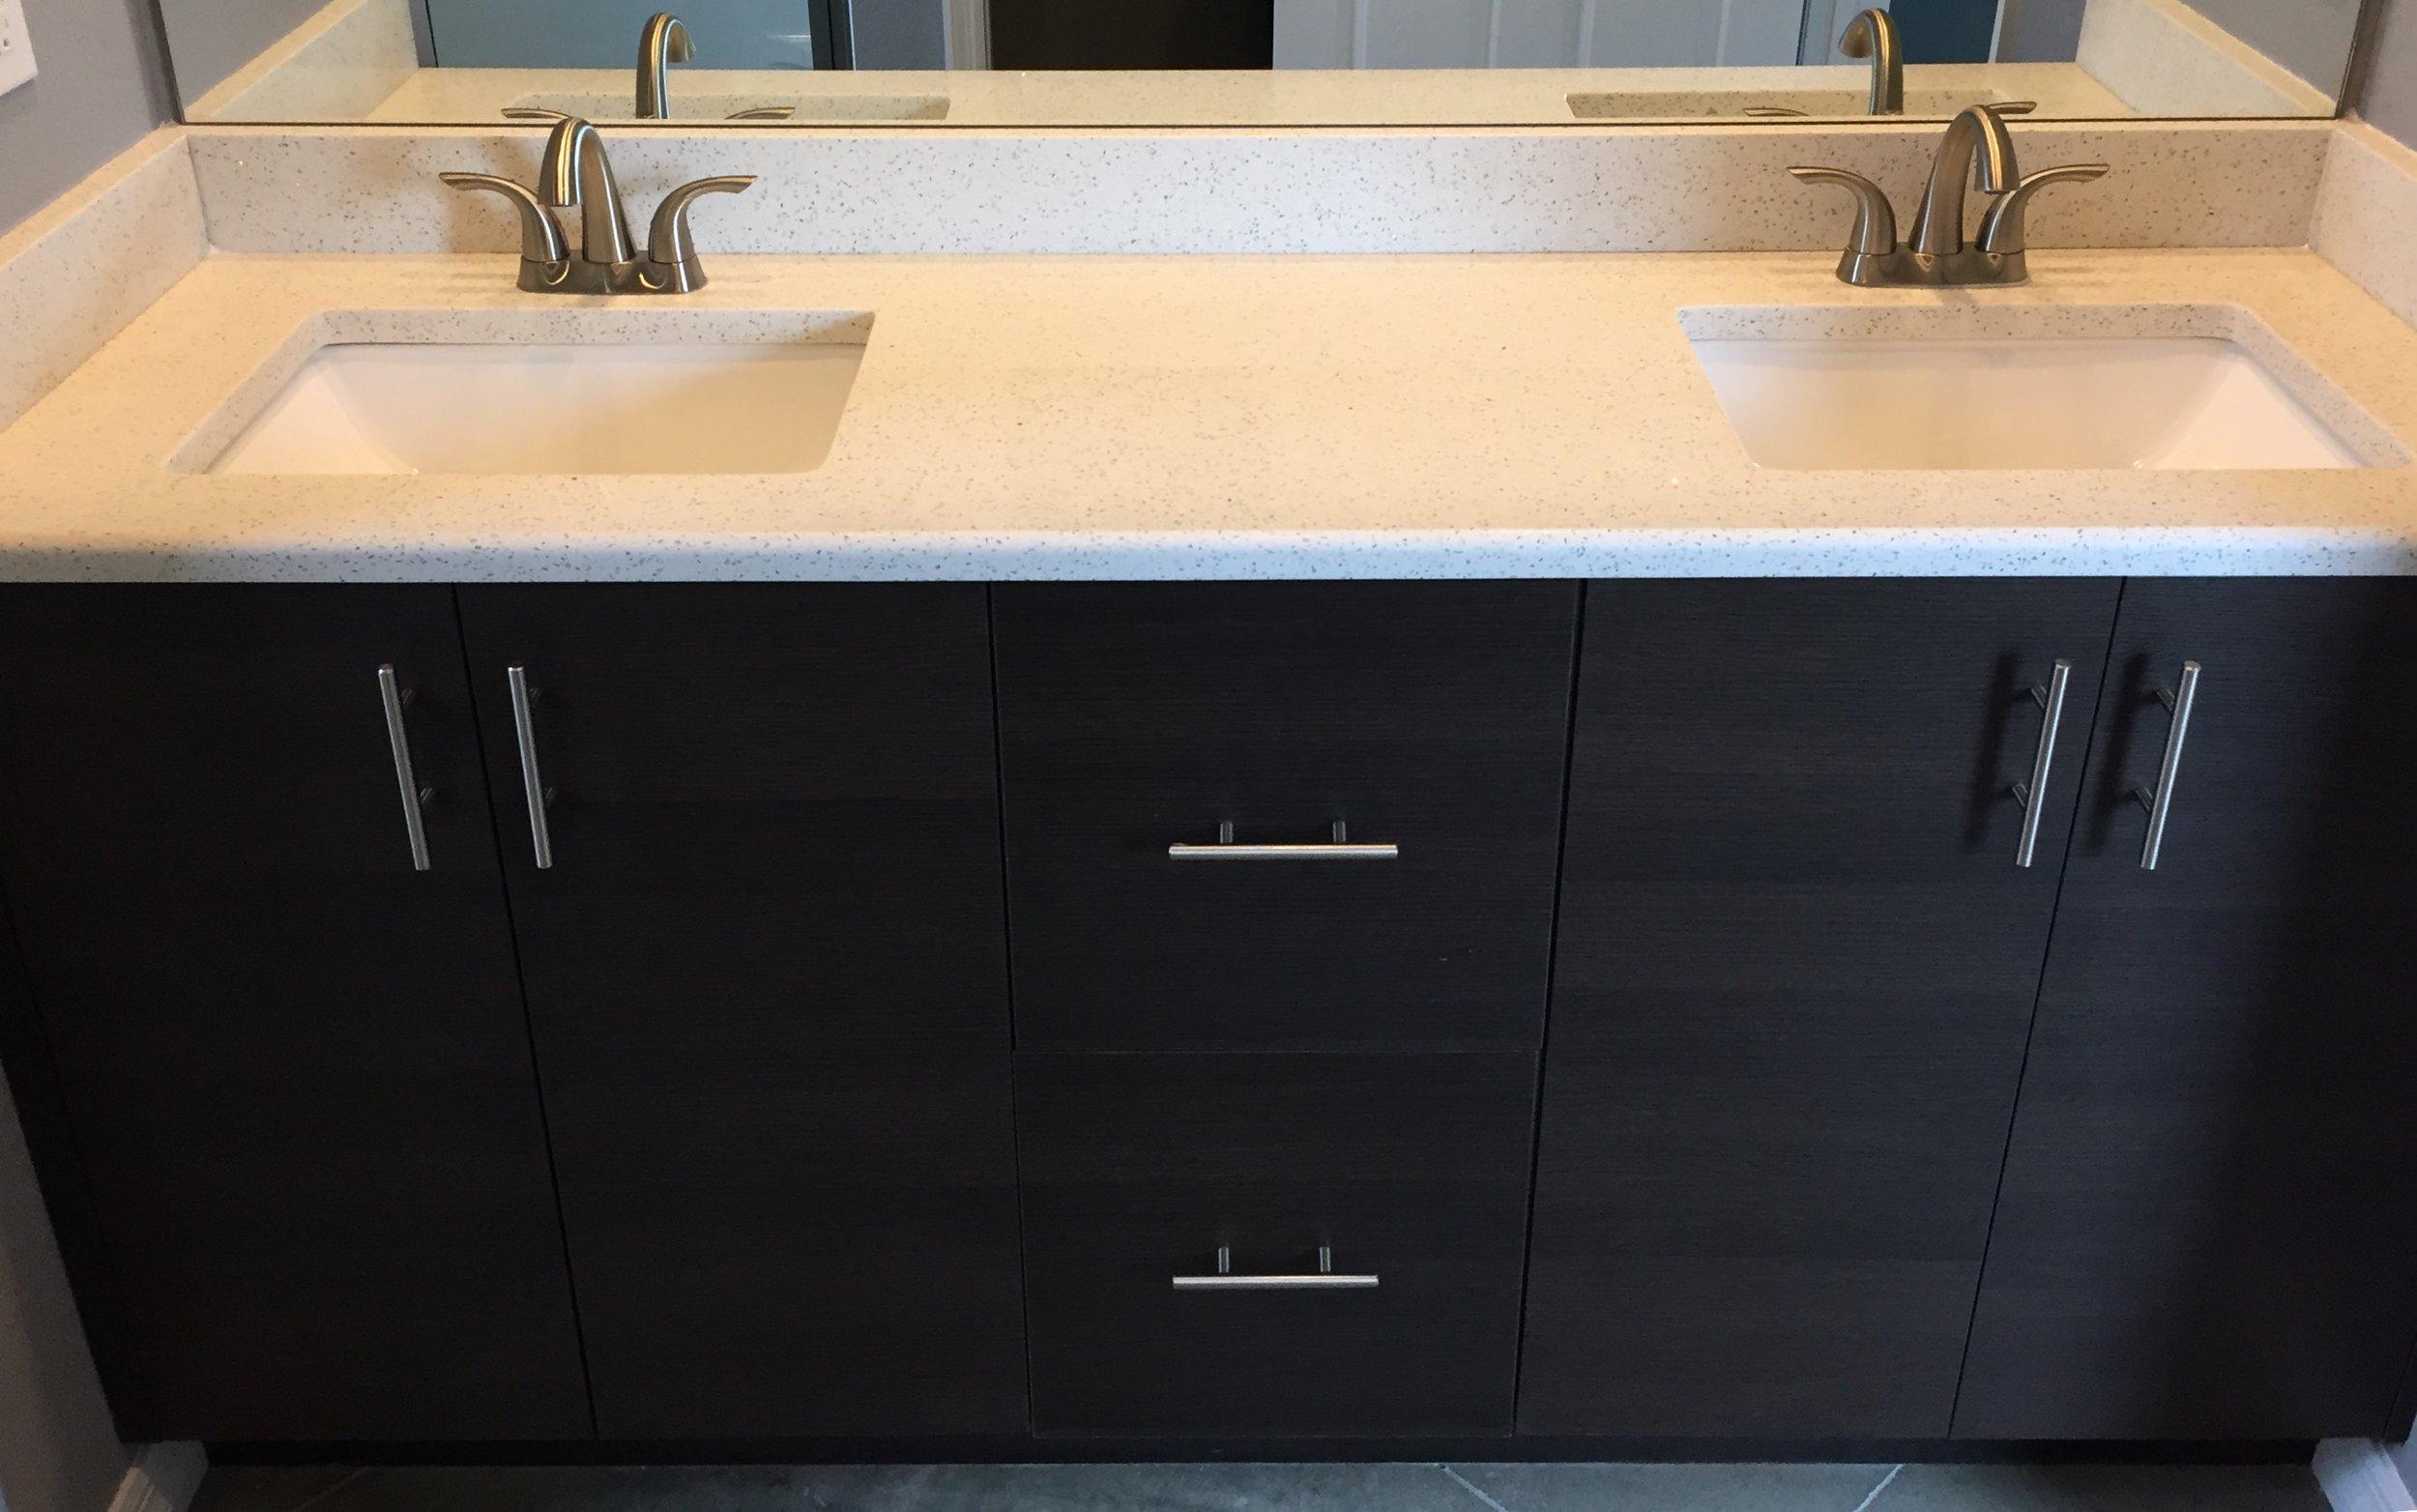 L92KV master sink 3.jpg